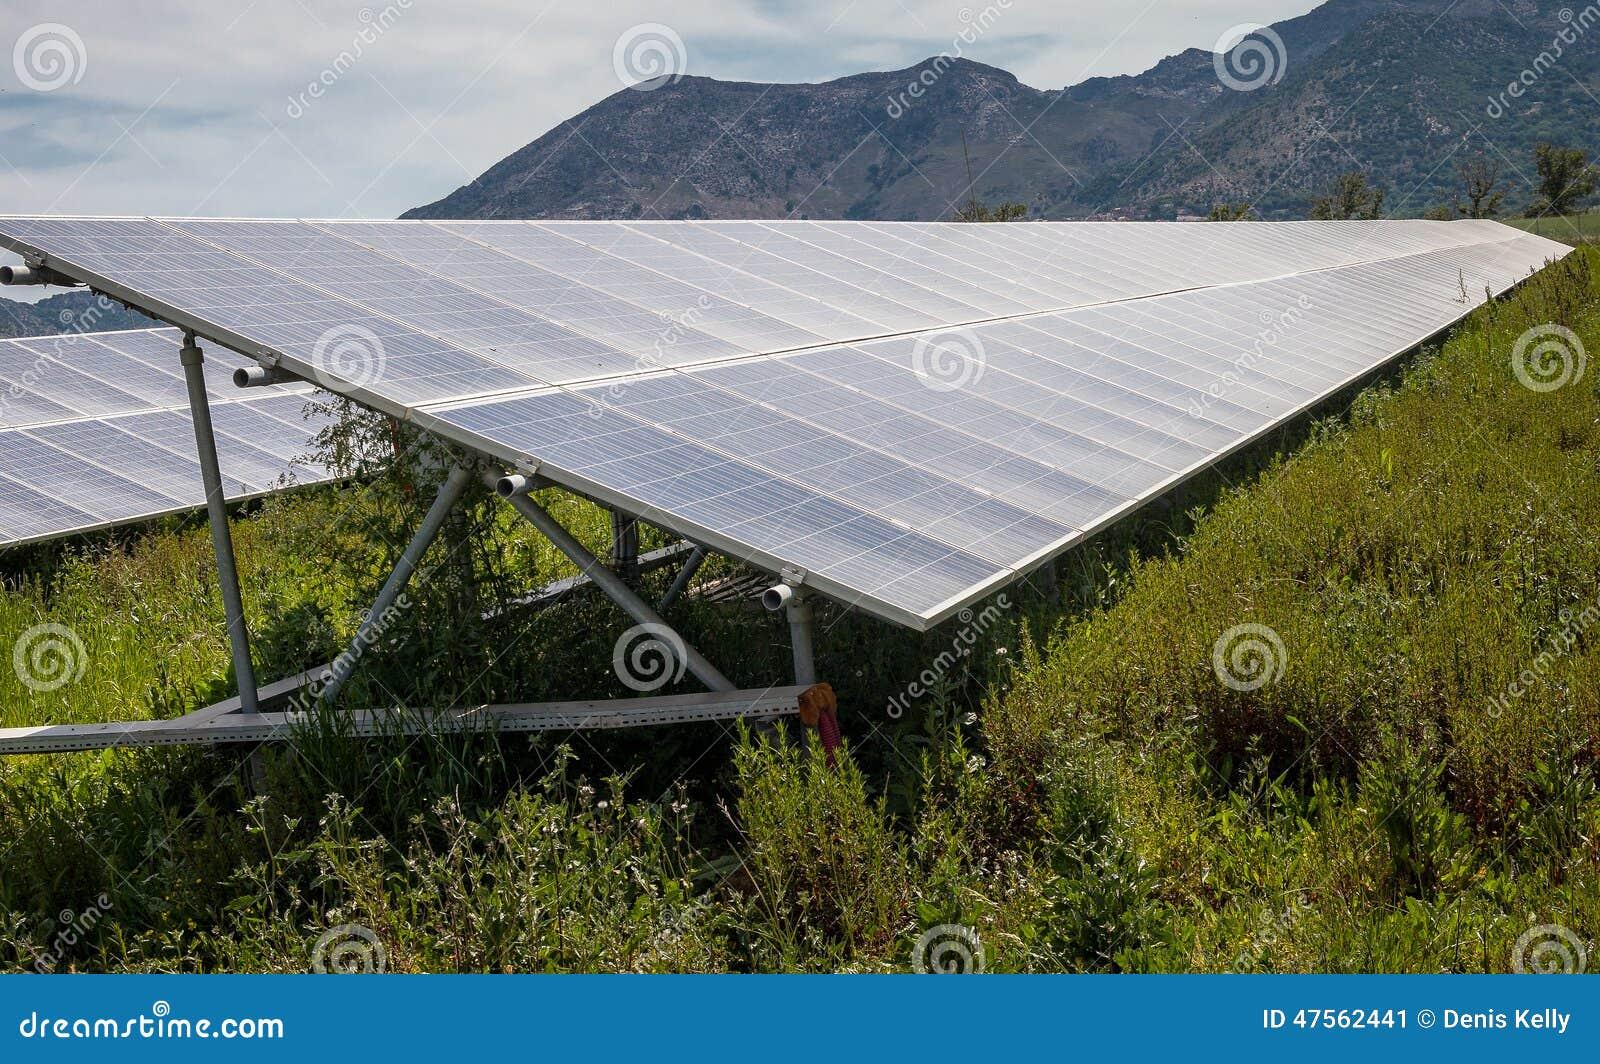 Solar Panels on Farmland - Renewable Energy